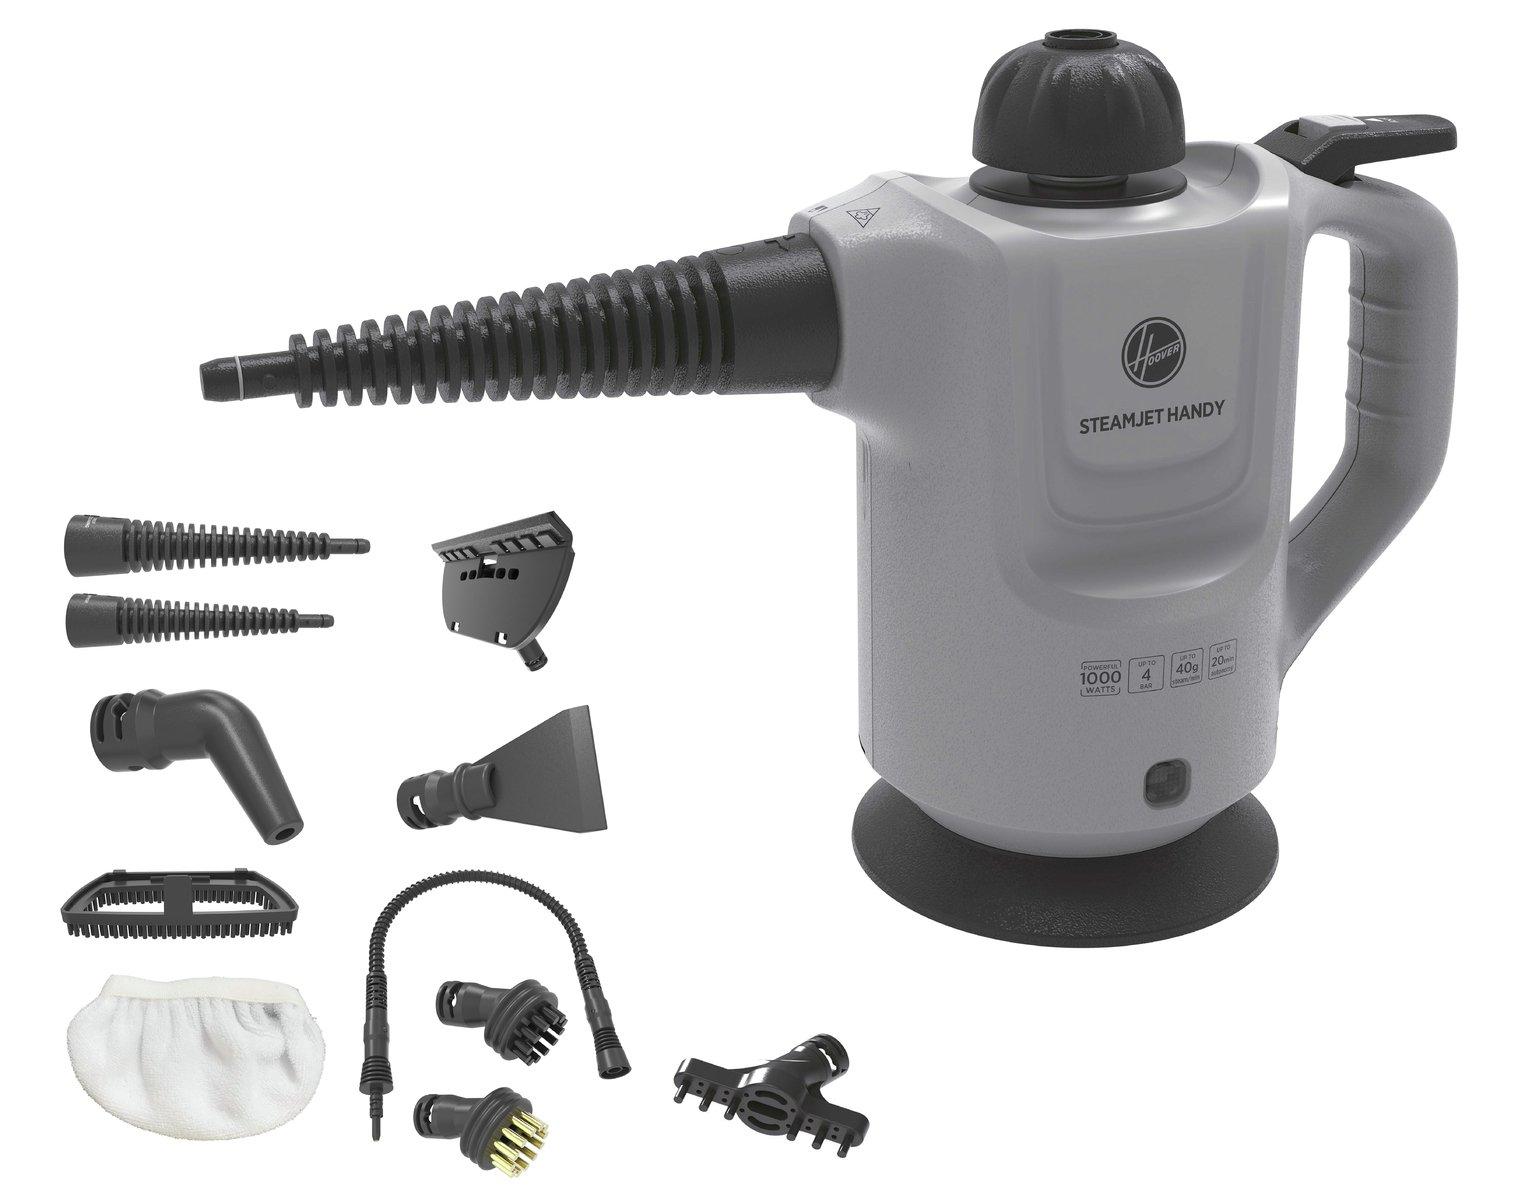 Hoover SGE1000 SteamJet Handheld Steam Cleaner